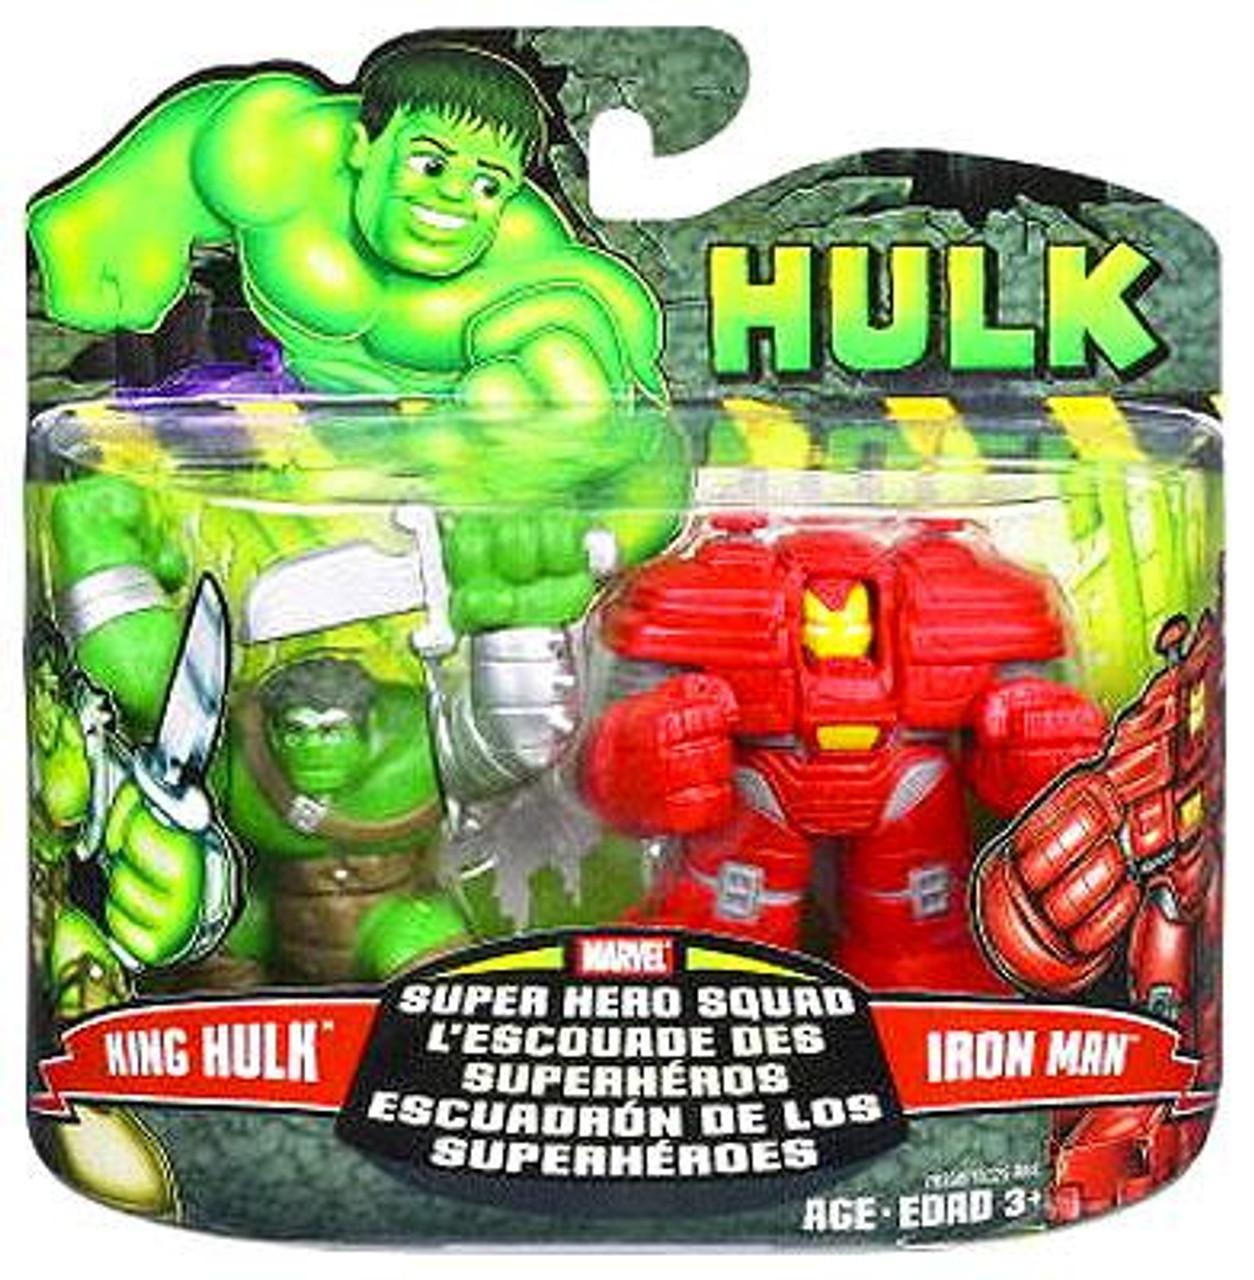 Hulk clipart superhero squad, Picture #84980 hulk clipart ... | 1280x1254